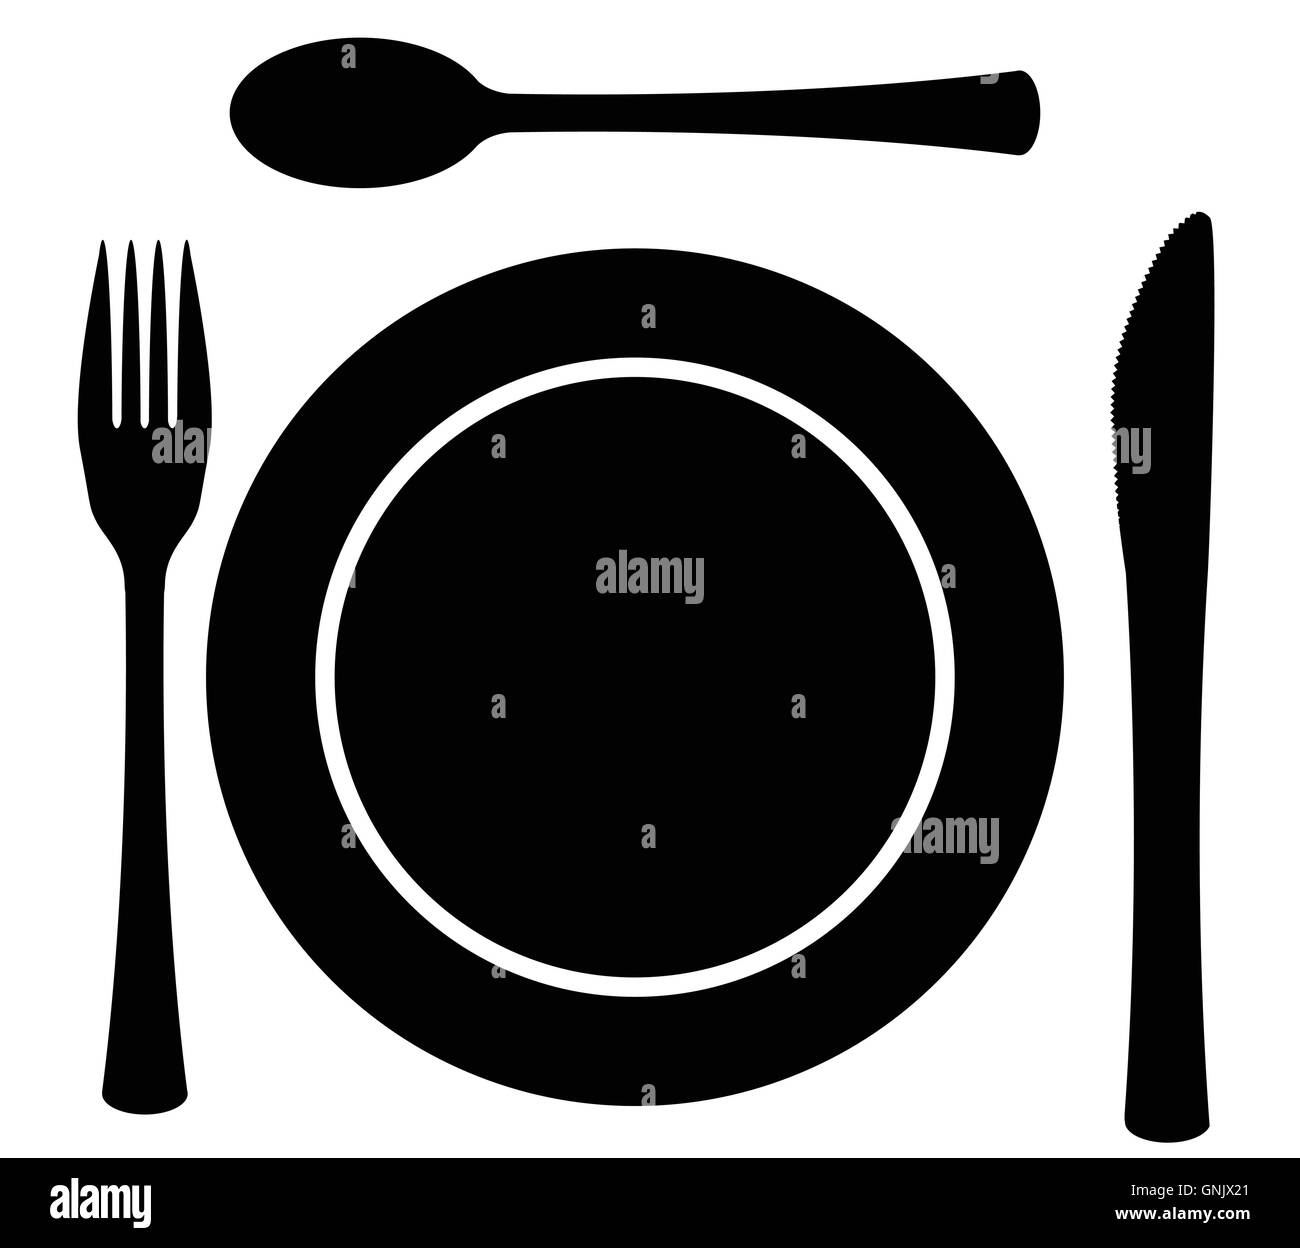 Metal Cutlery Plate Setting - Stock Image